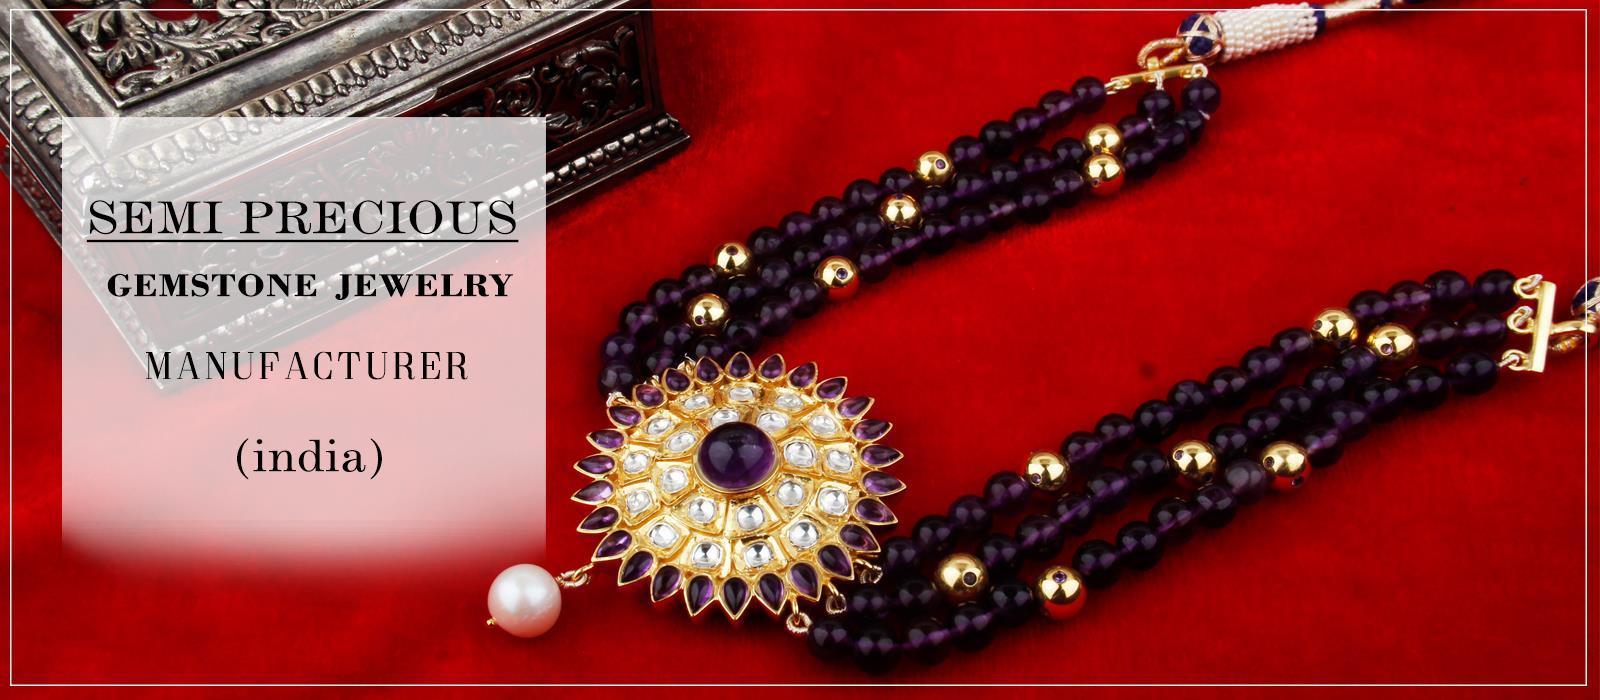 Wholesale semi precious gemstone beads jewelry manufacturer in India